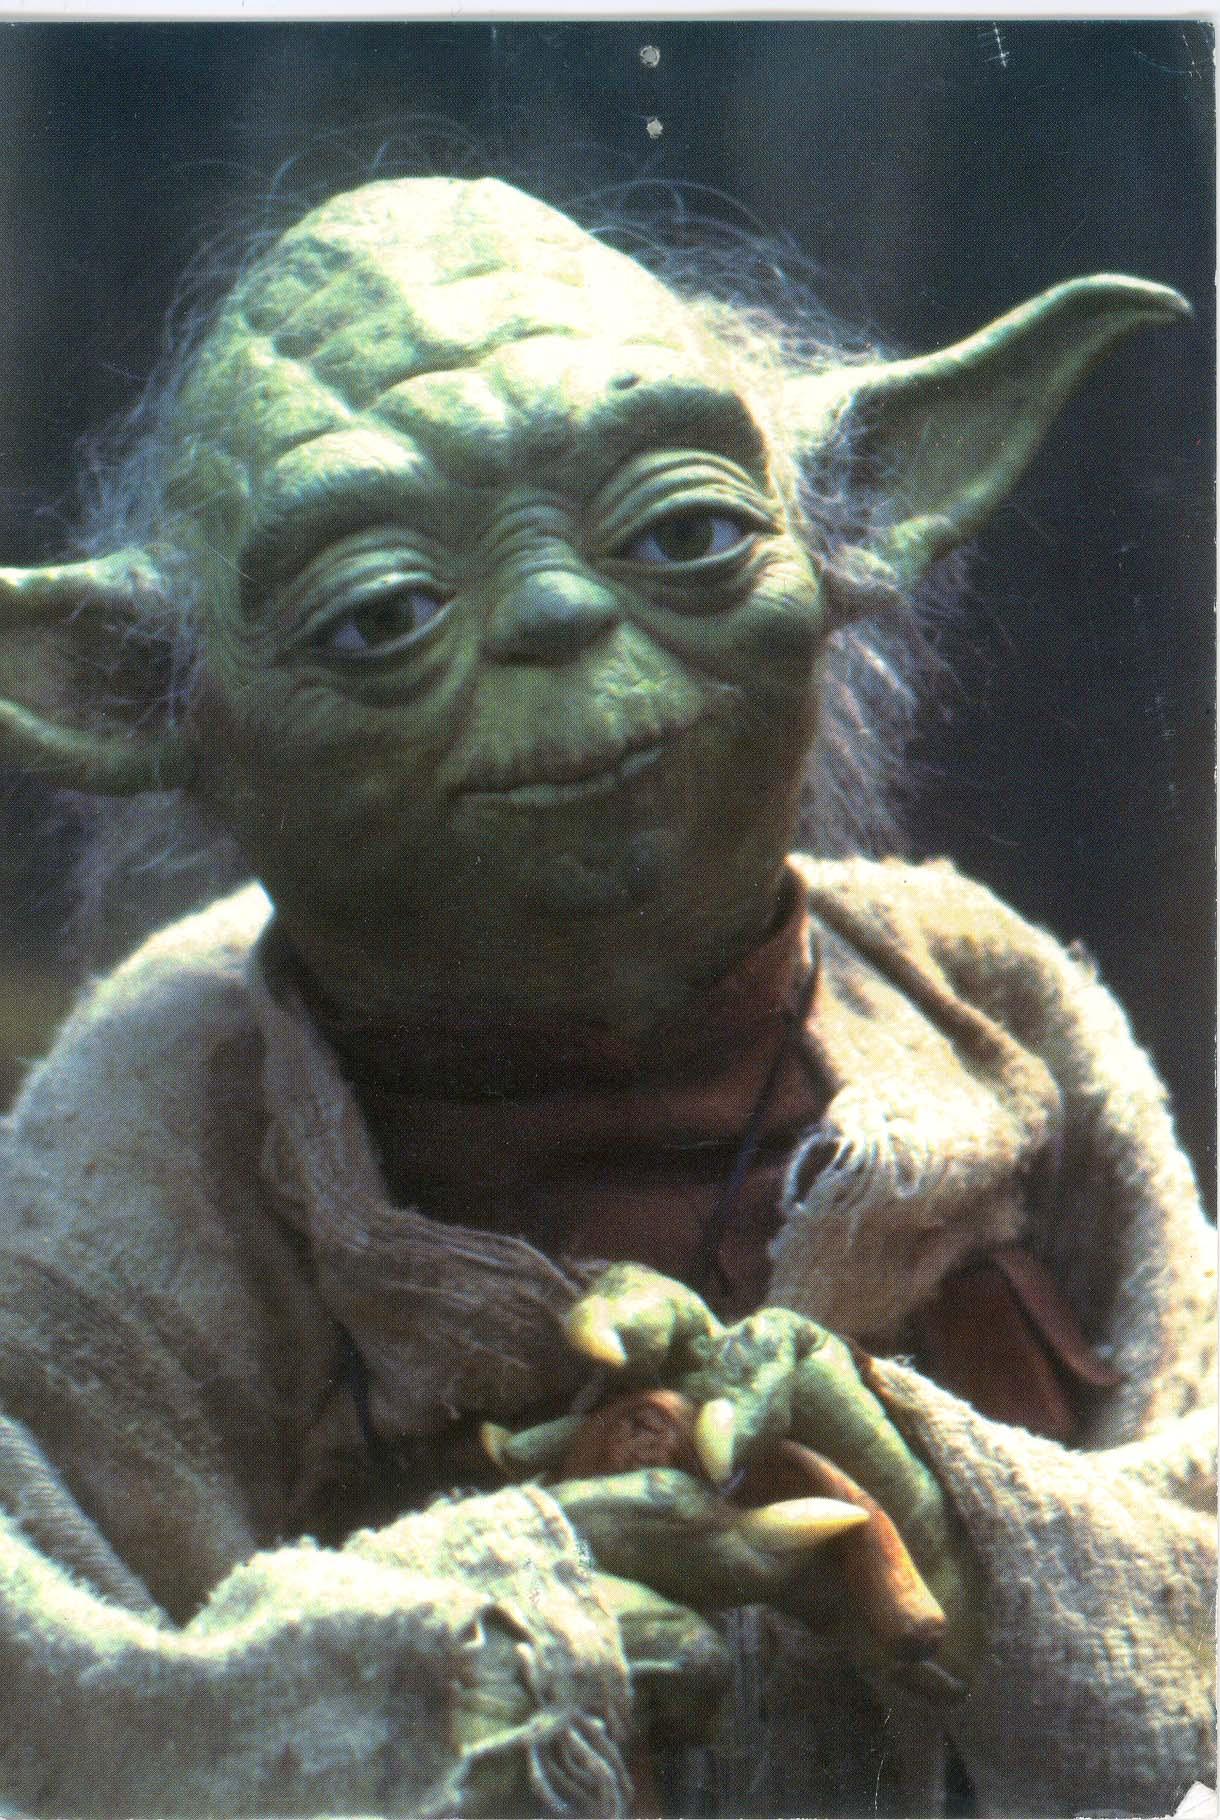 Yoda, looking good for 900